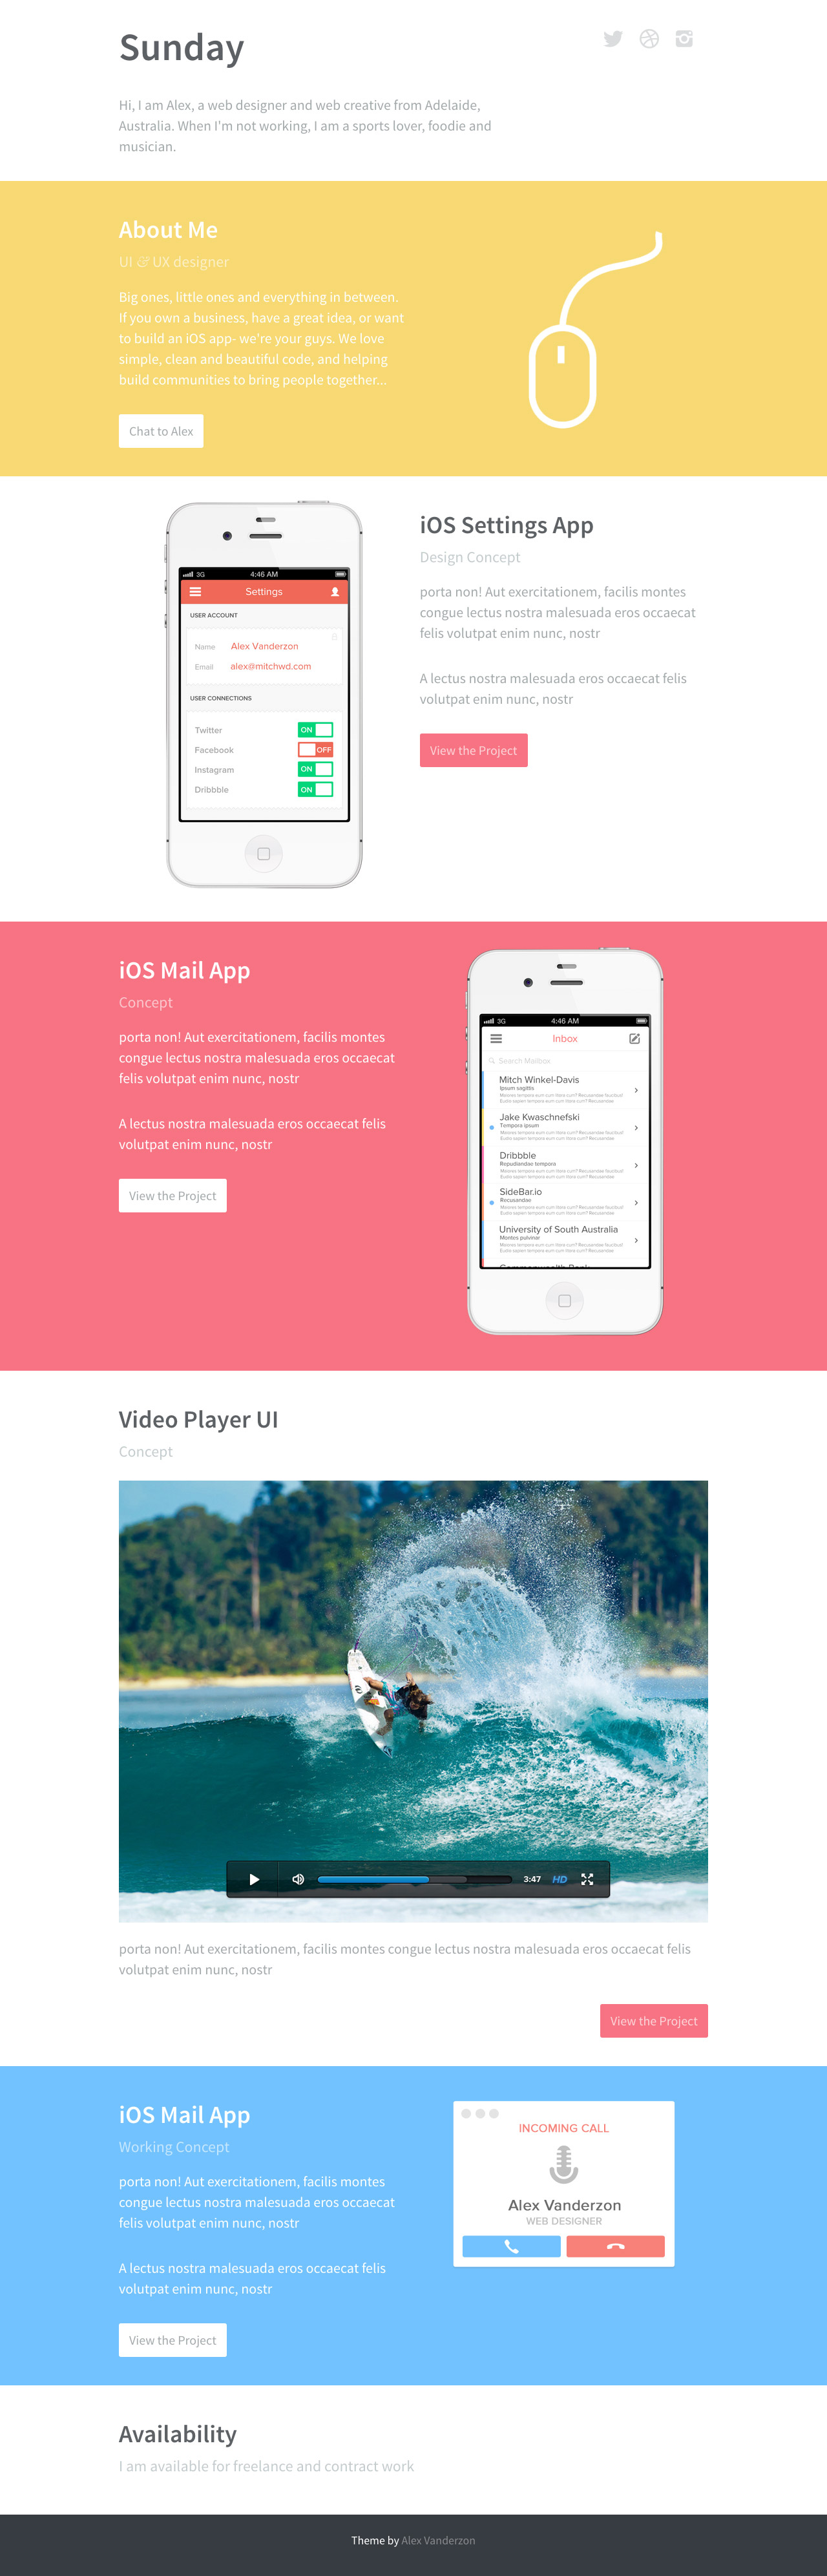 Sunday Website Screenshot